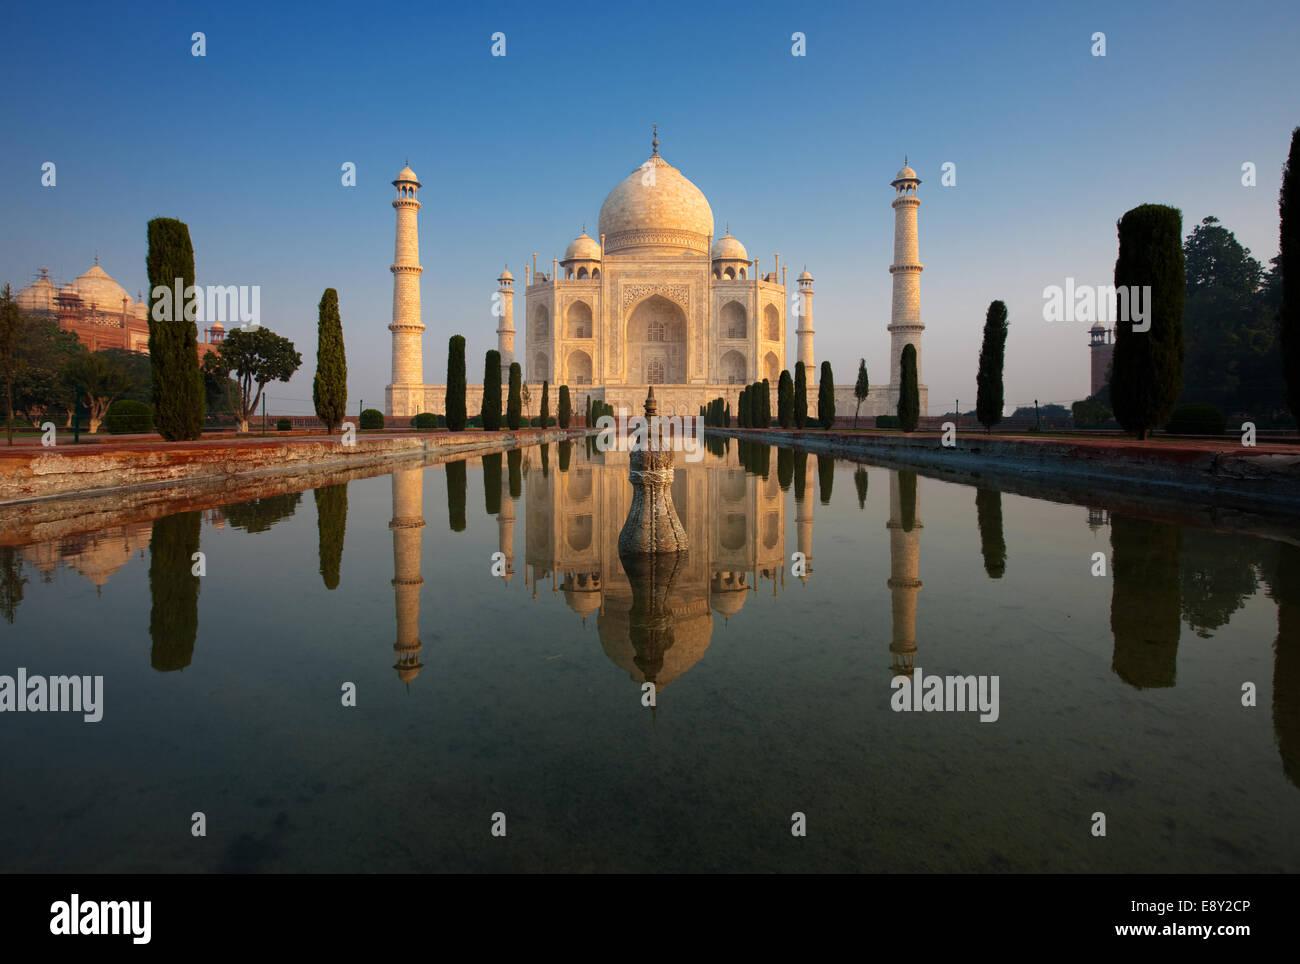 Empty Taj Mahal & Reflection at Sunrise - Stock Image